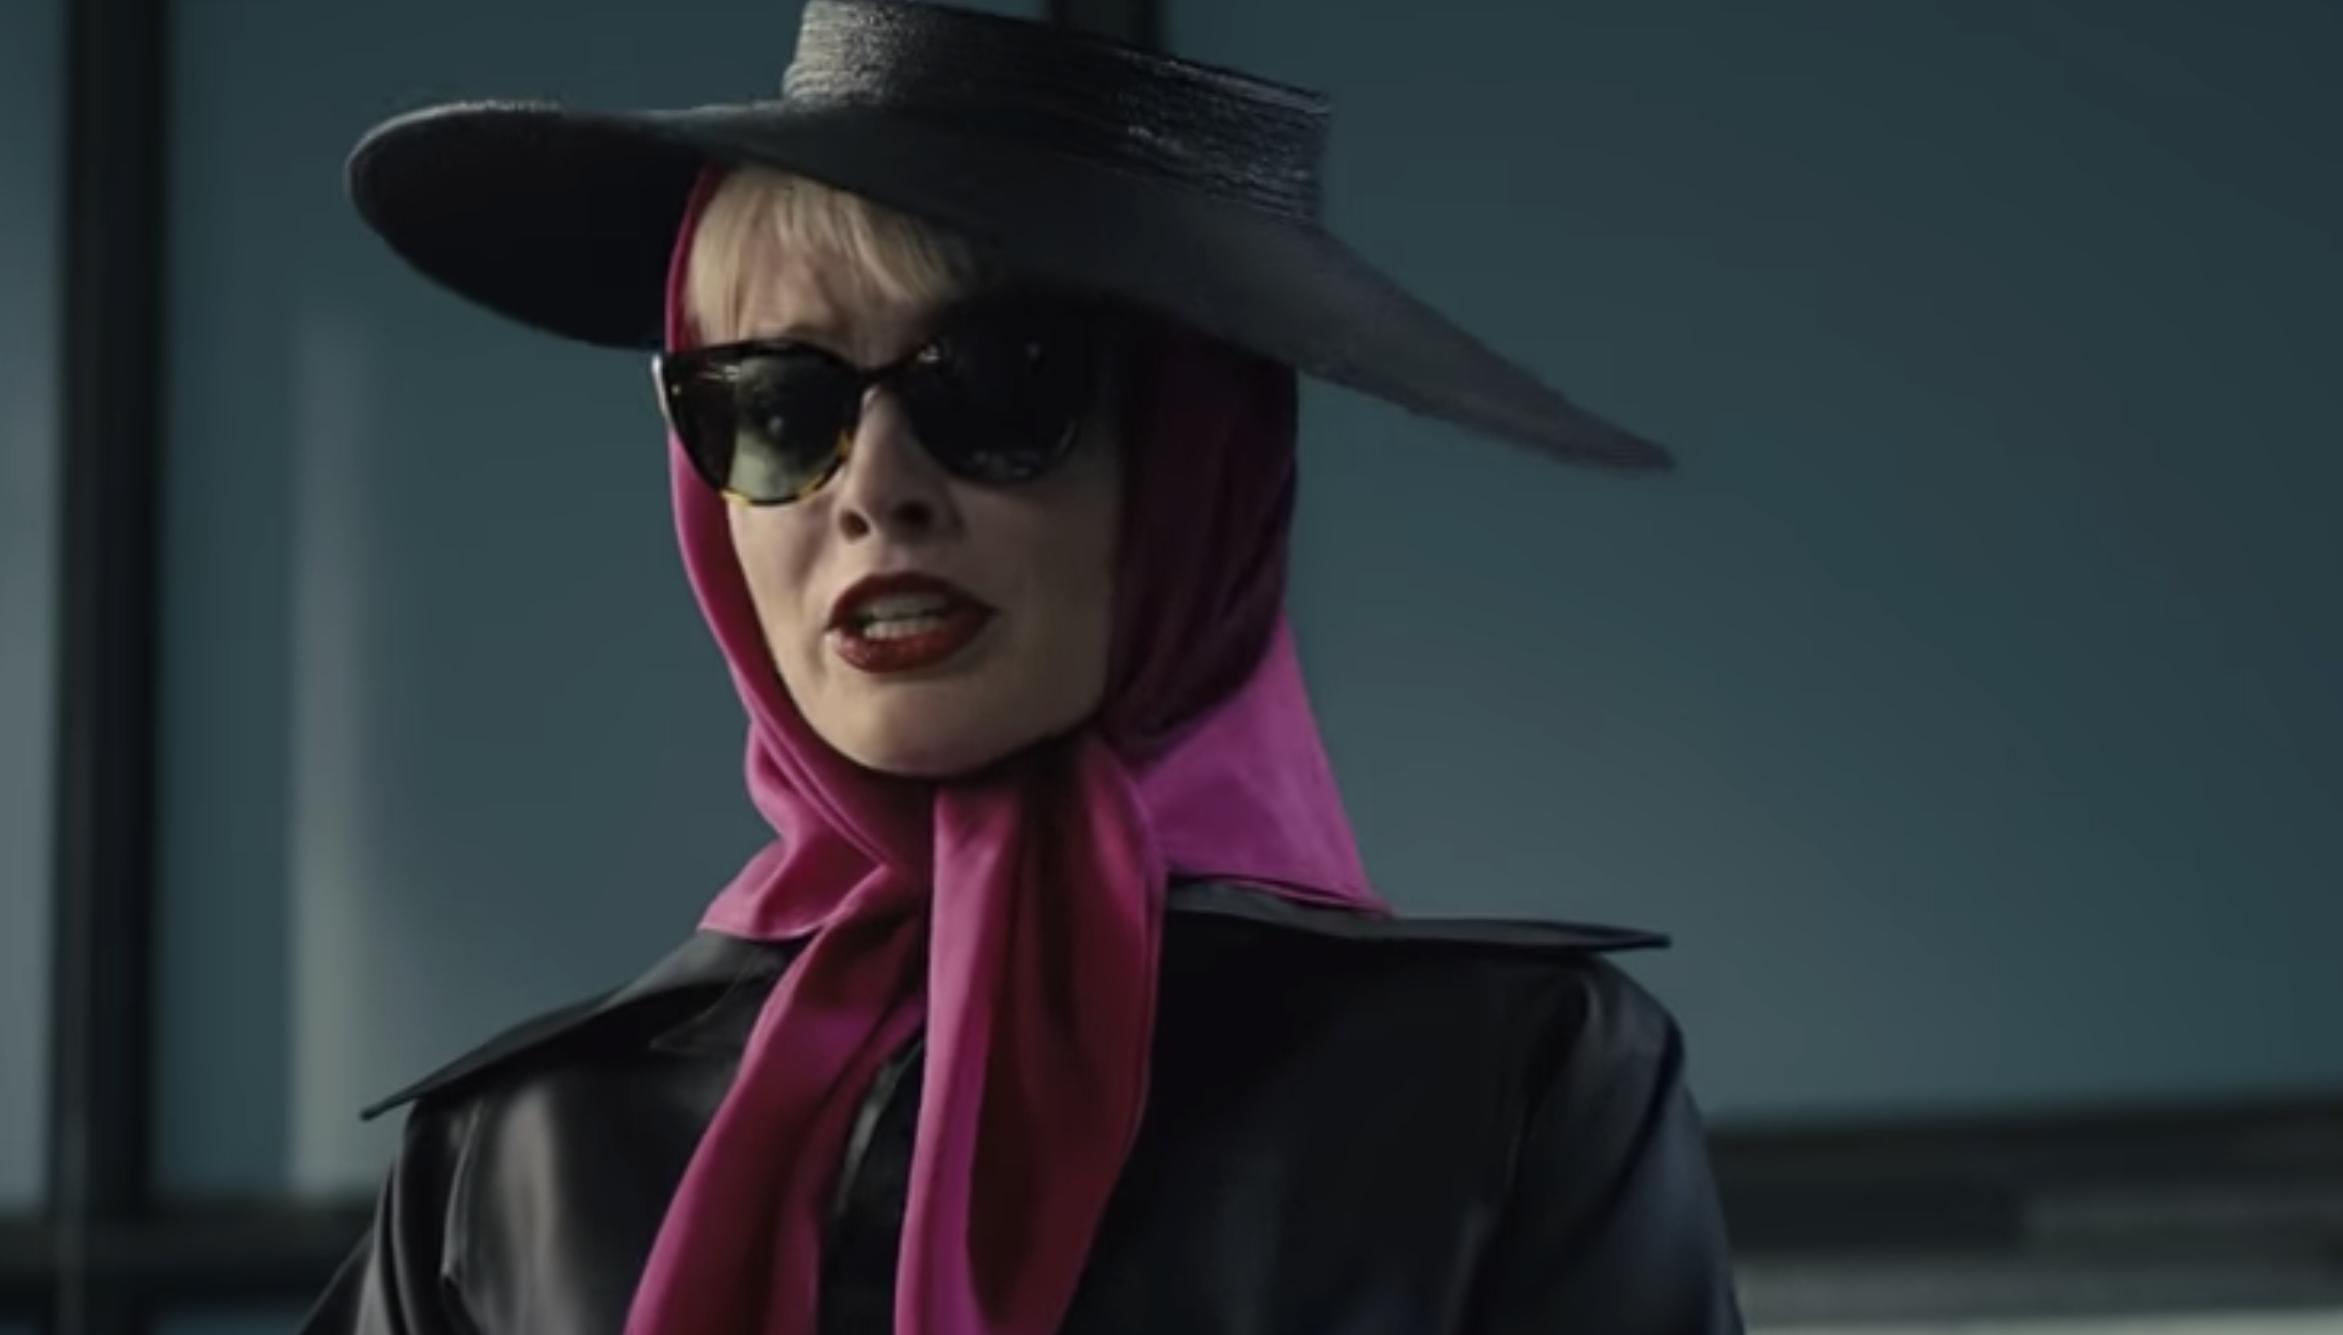 Joker Gets Blown Up Bruce Wayne Is A Hyena In New Birds Of Prey Trailer 101wkqx Wkqx Fm